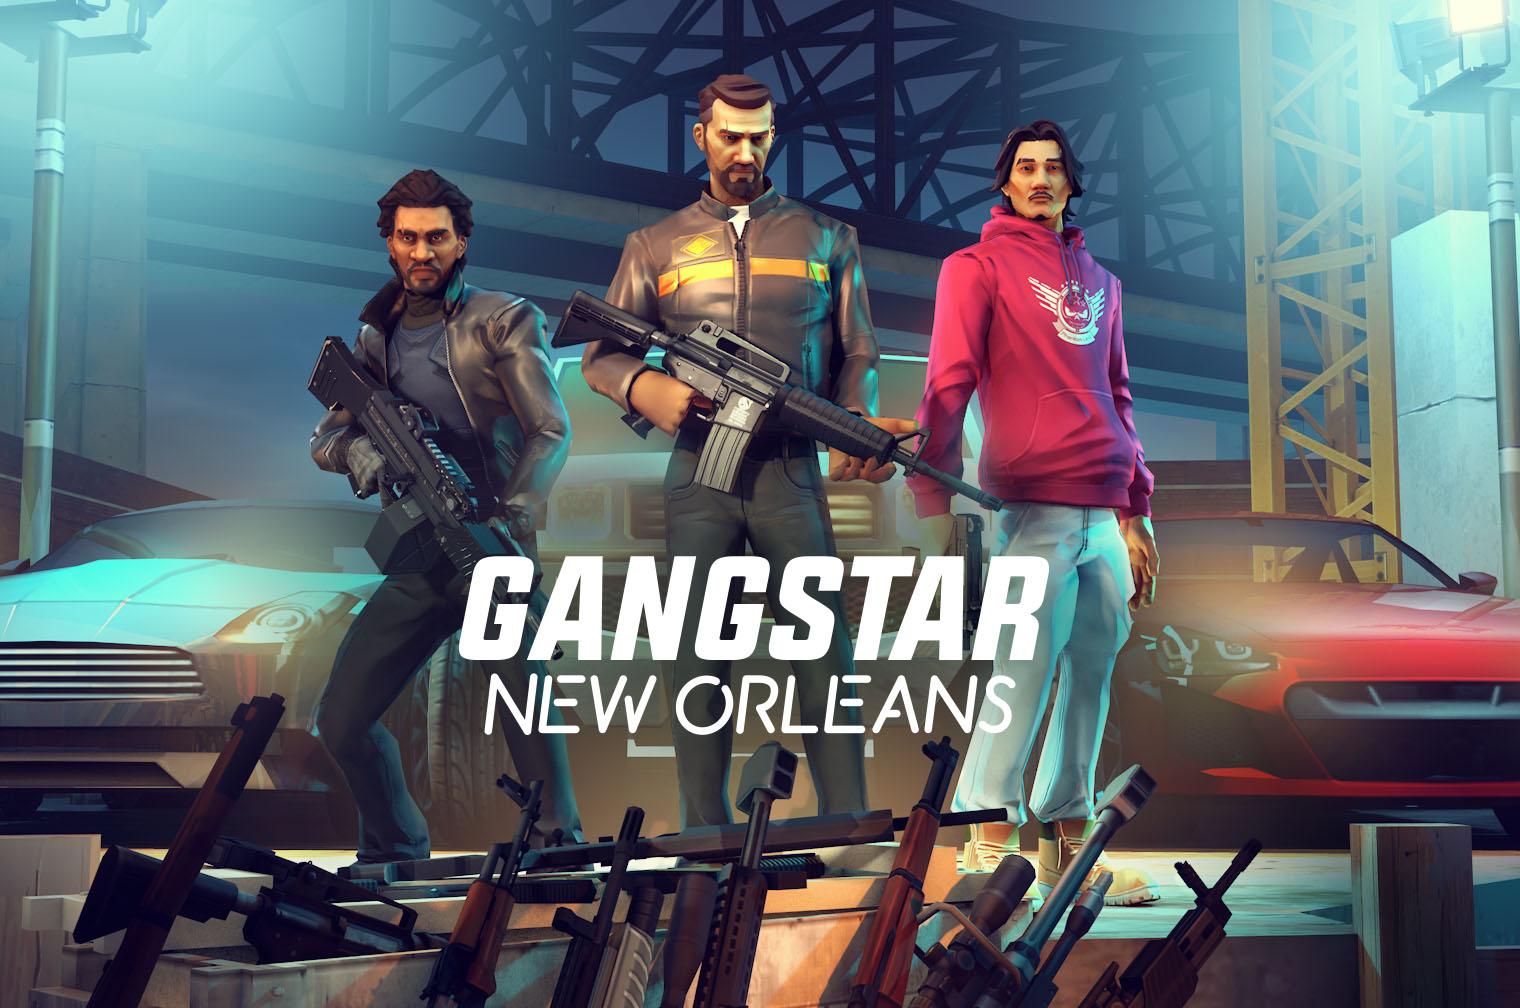 Wallpaper 3 Gangstar New Orleans